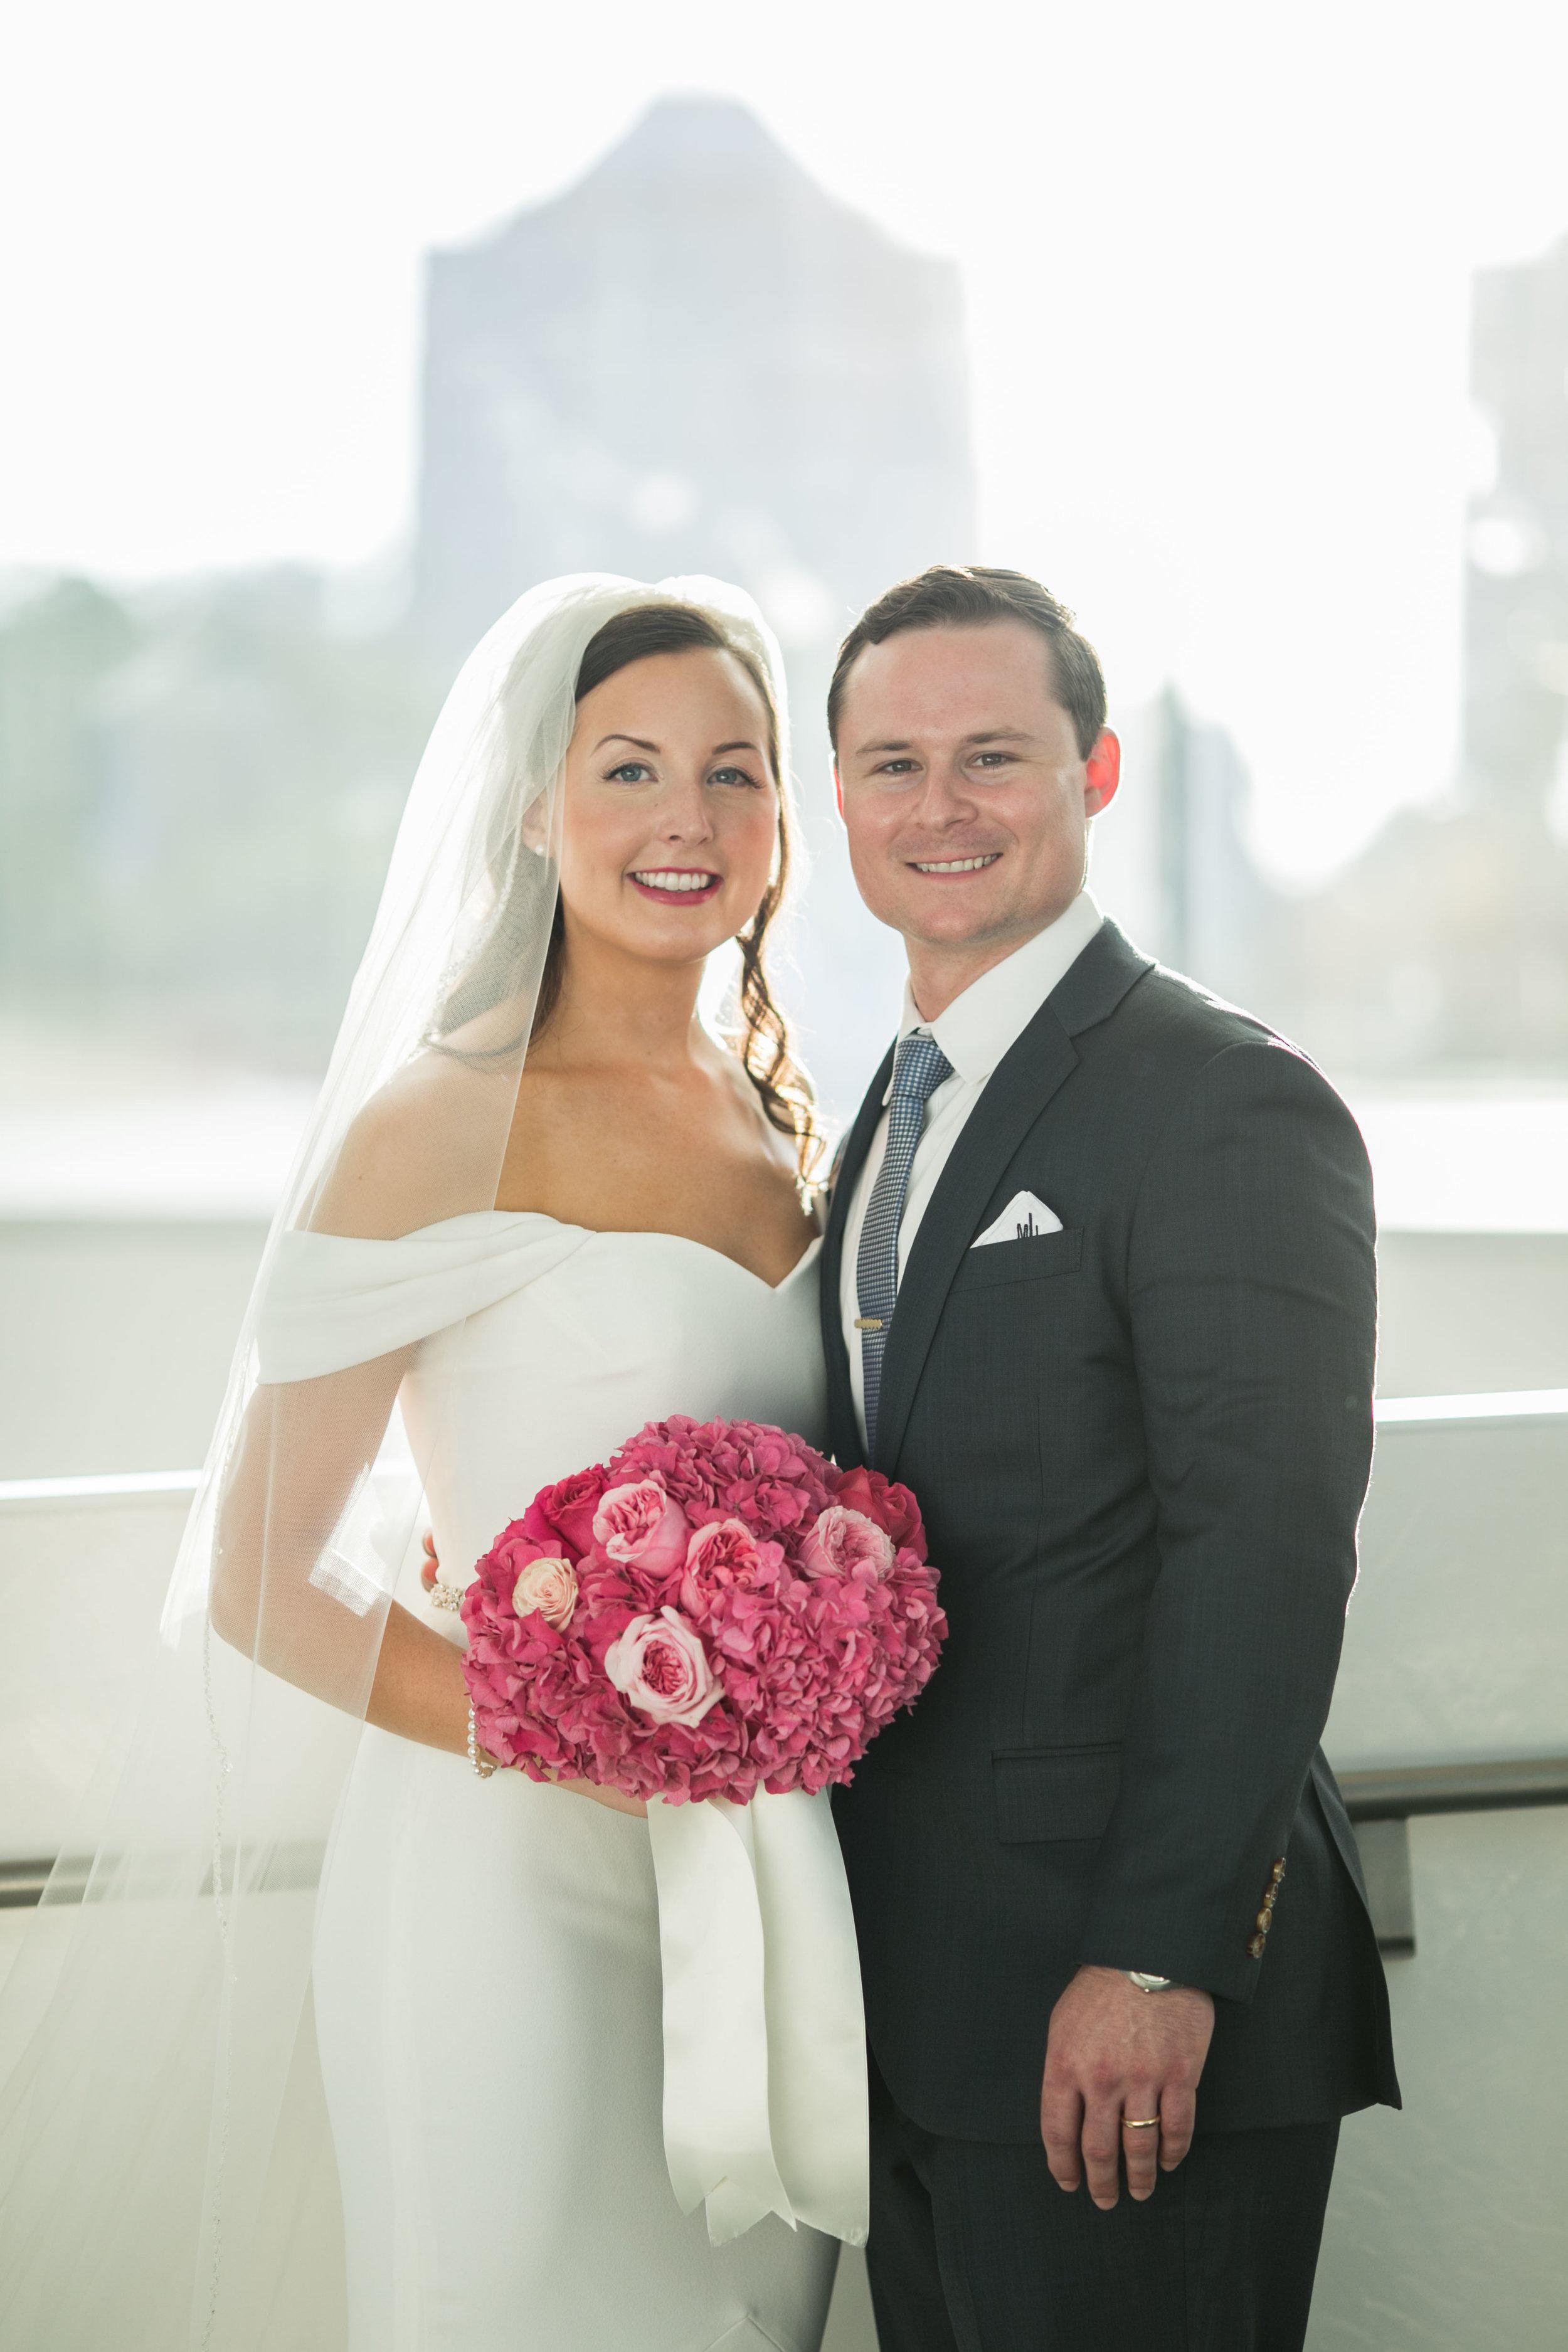 nelson-atkins-wedding-55.jpg